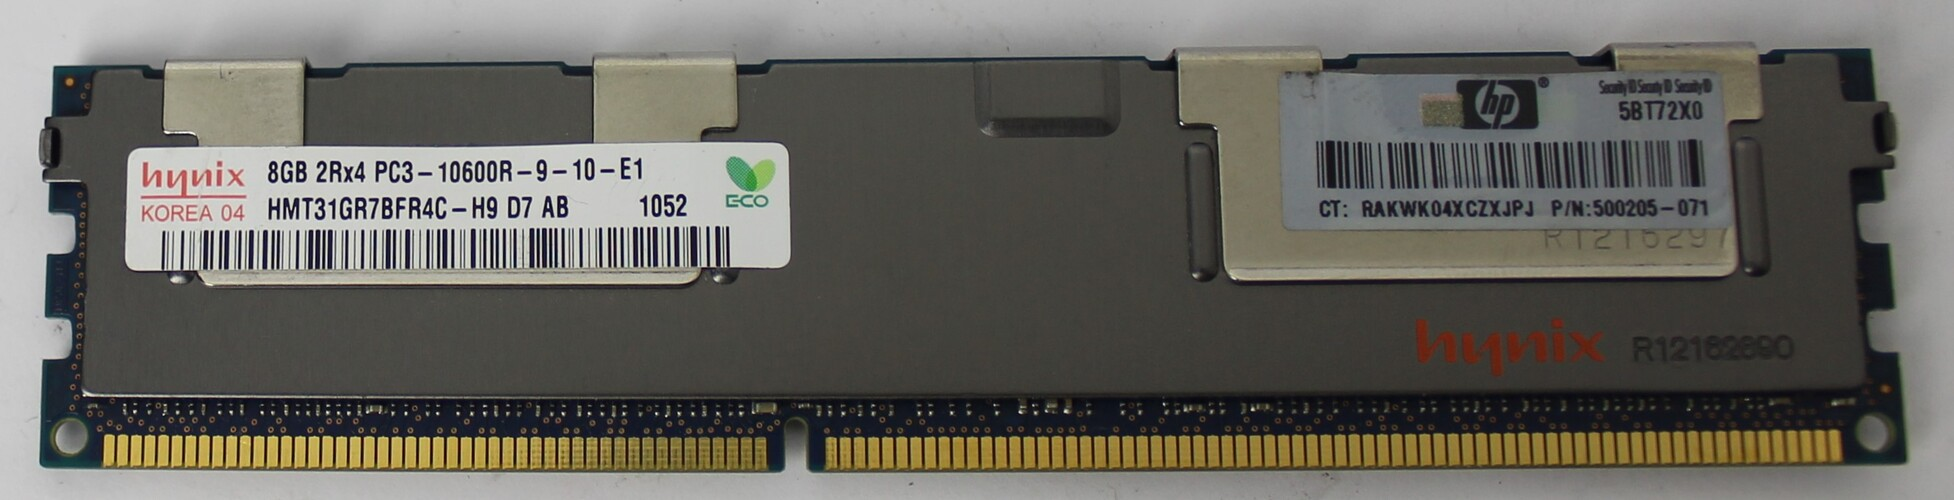 MEMORIA DE SERVIDOR HYNIX 8GB 2RX4 PC3-10600R-09-10-E1